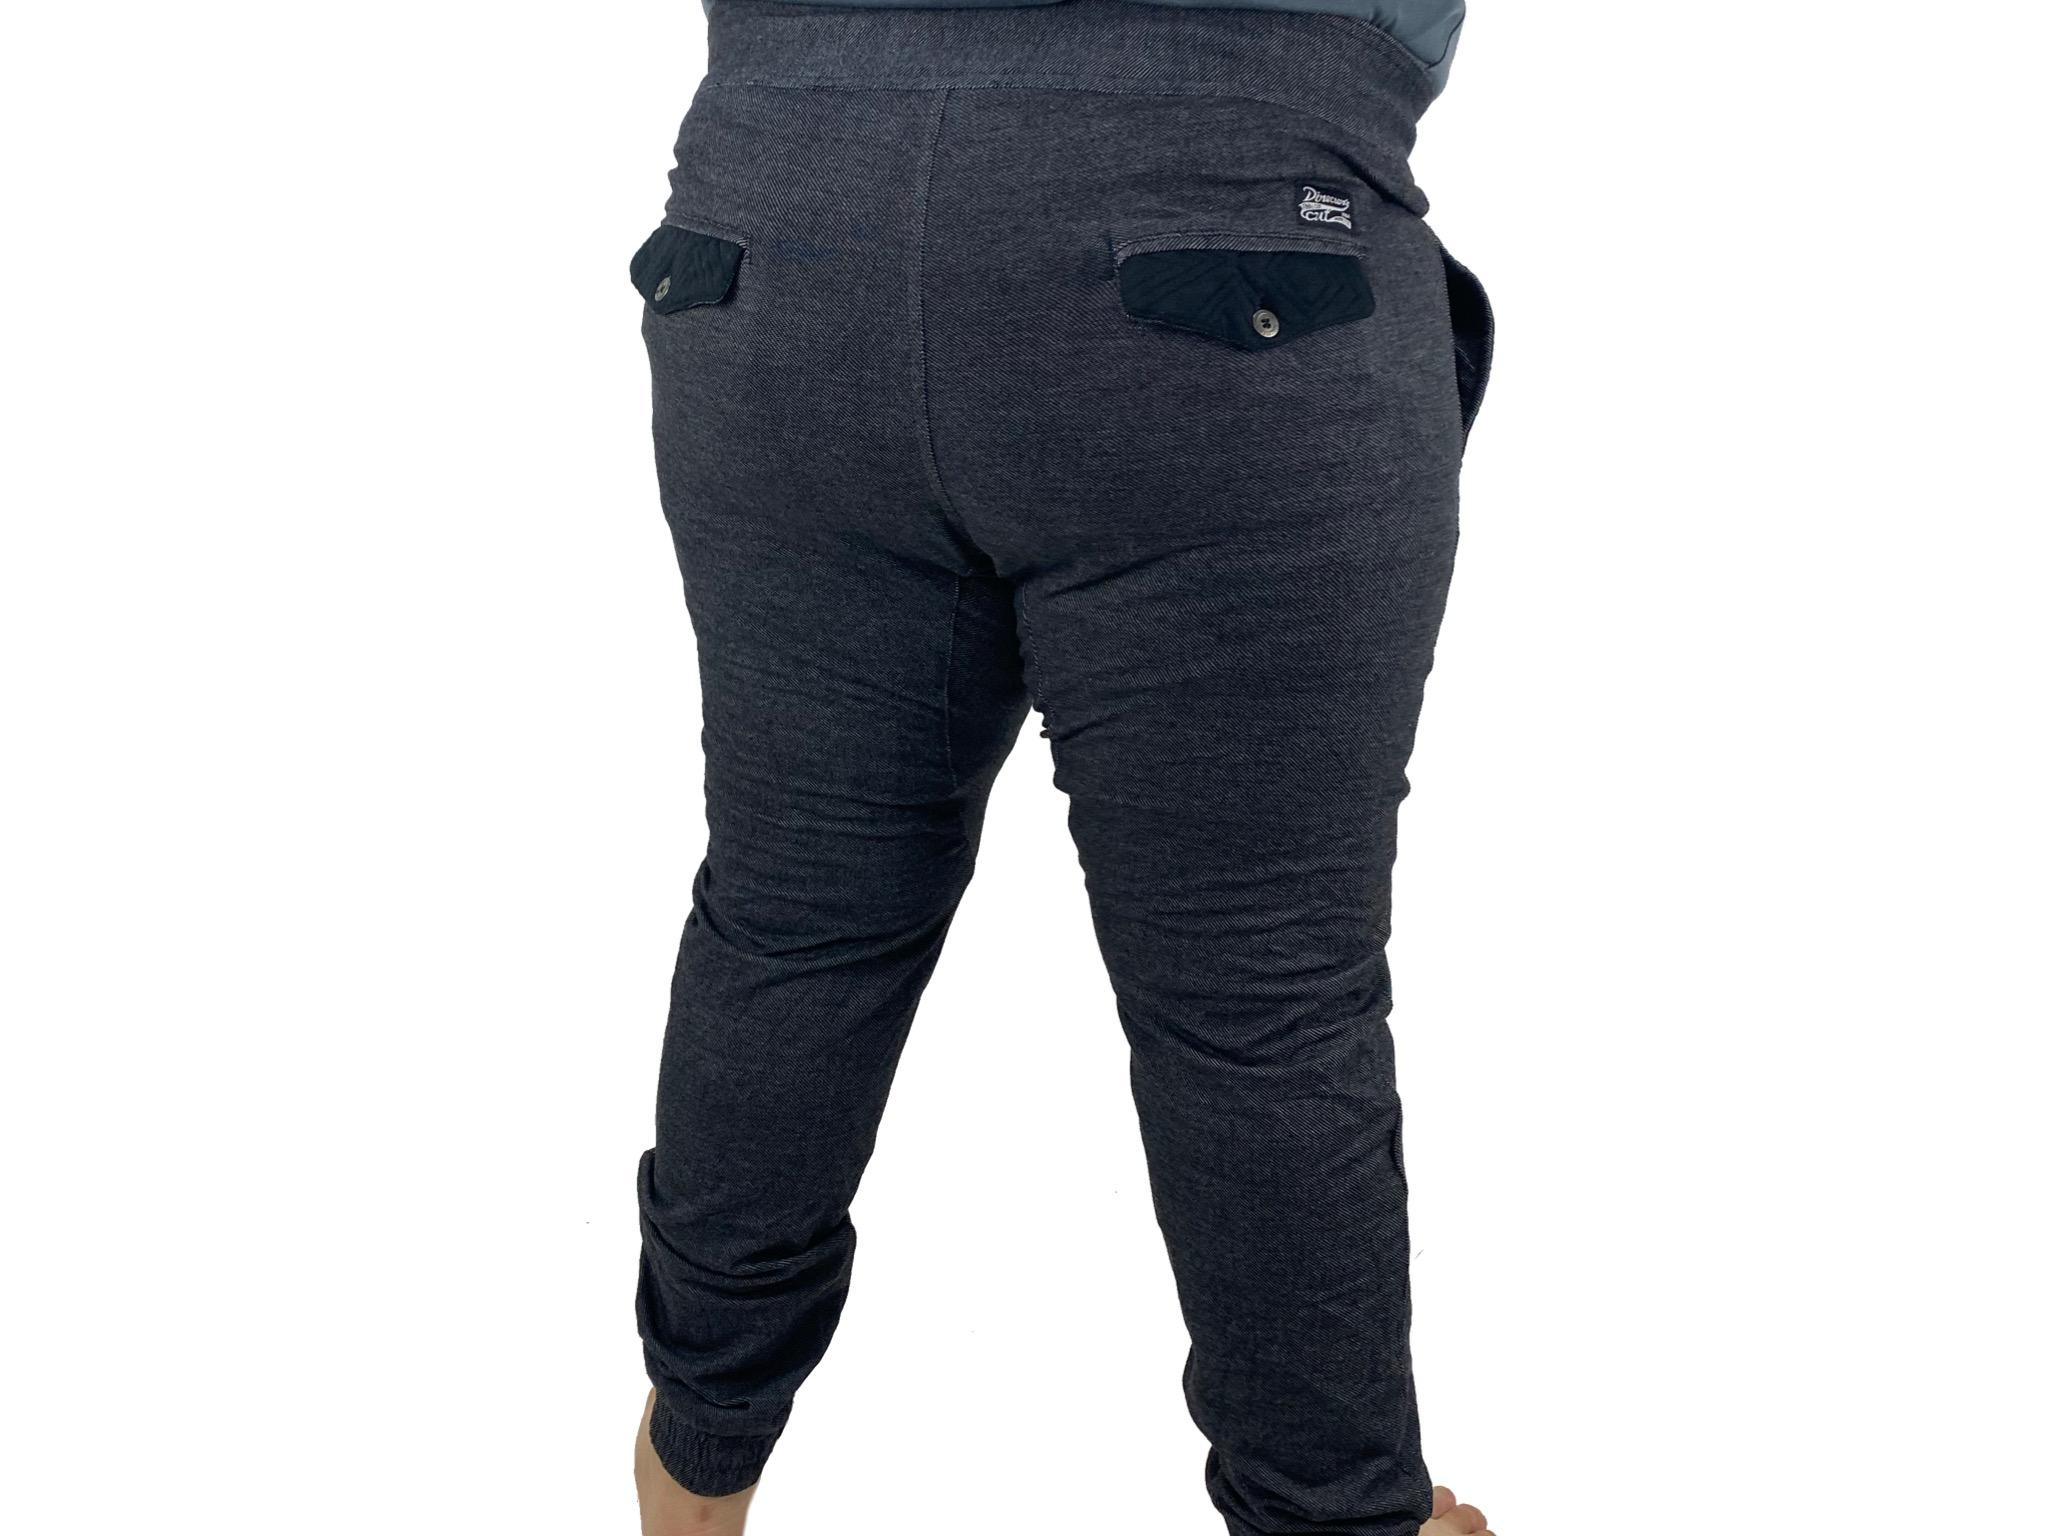 Pantalon Jogger Hombre Gris Con Negro Directors Cut Nuevo Dto Store